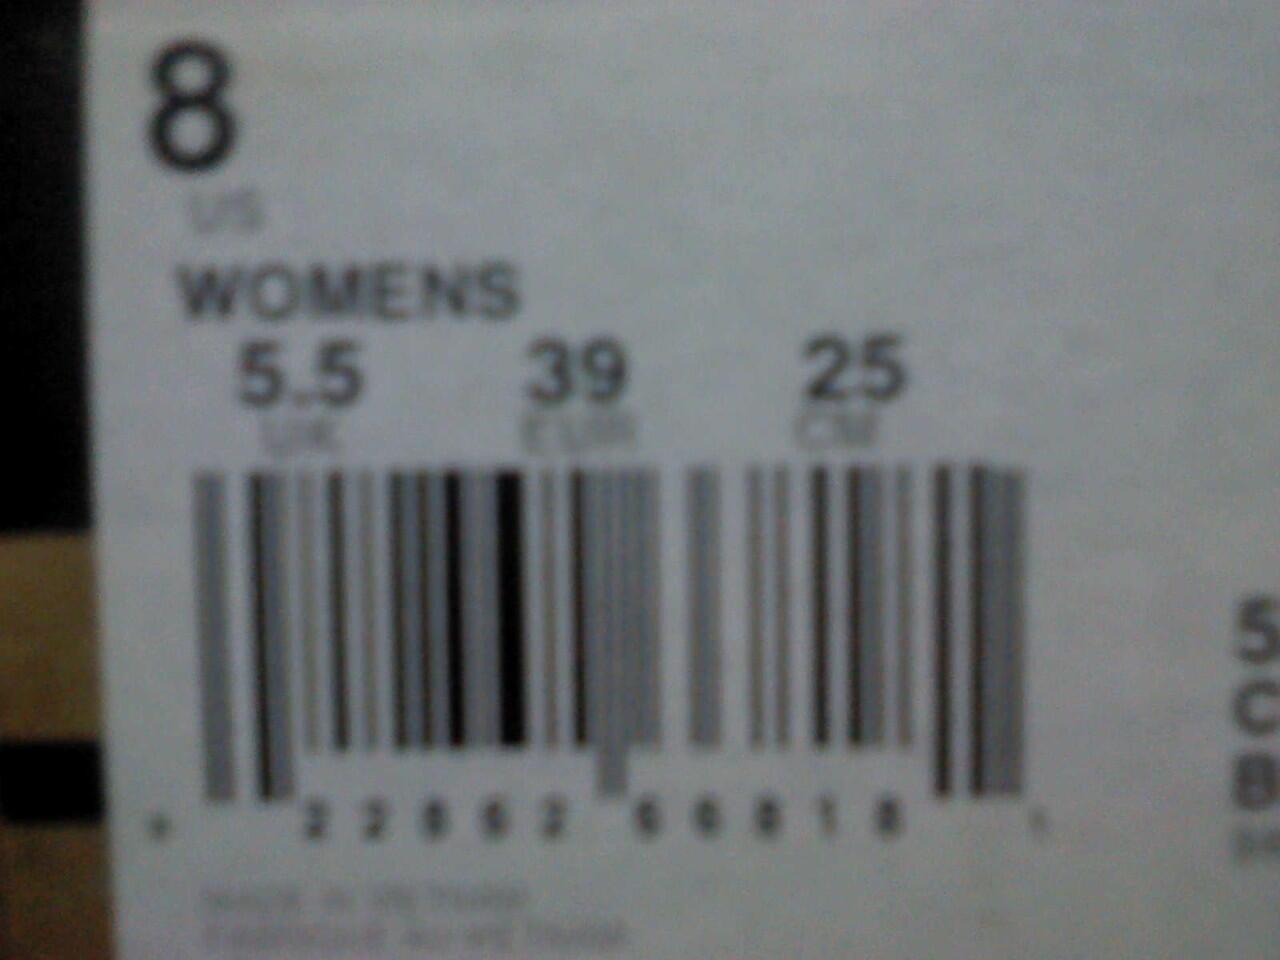 b97b76063c98 ... CONVERSE CT DANCE LACE OX BLACK uk. 8 WOMENS (Buat beli Mixer) Rp